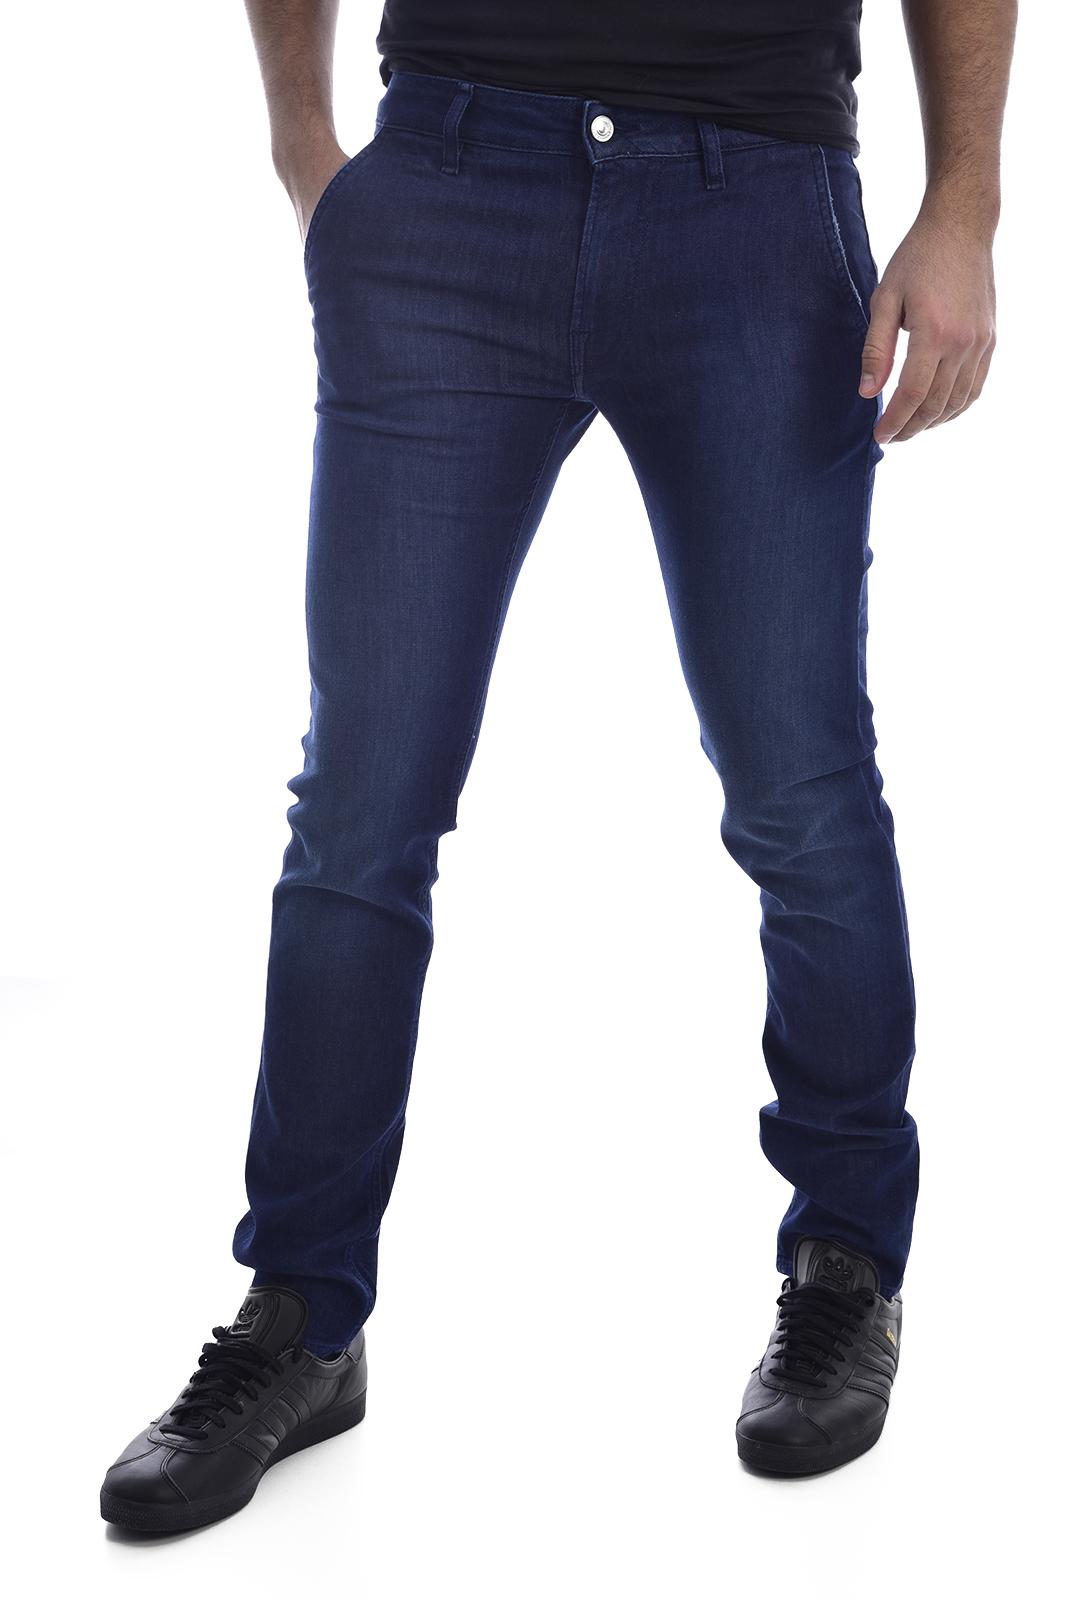 Jeans  Guess jeans M02A81 D3ZO2 ADAM TLOd LODGE